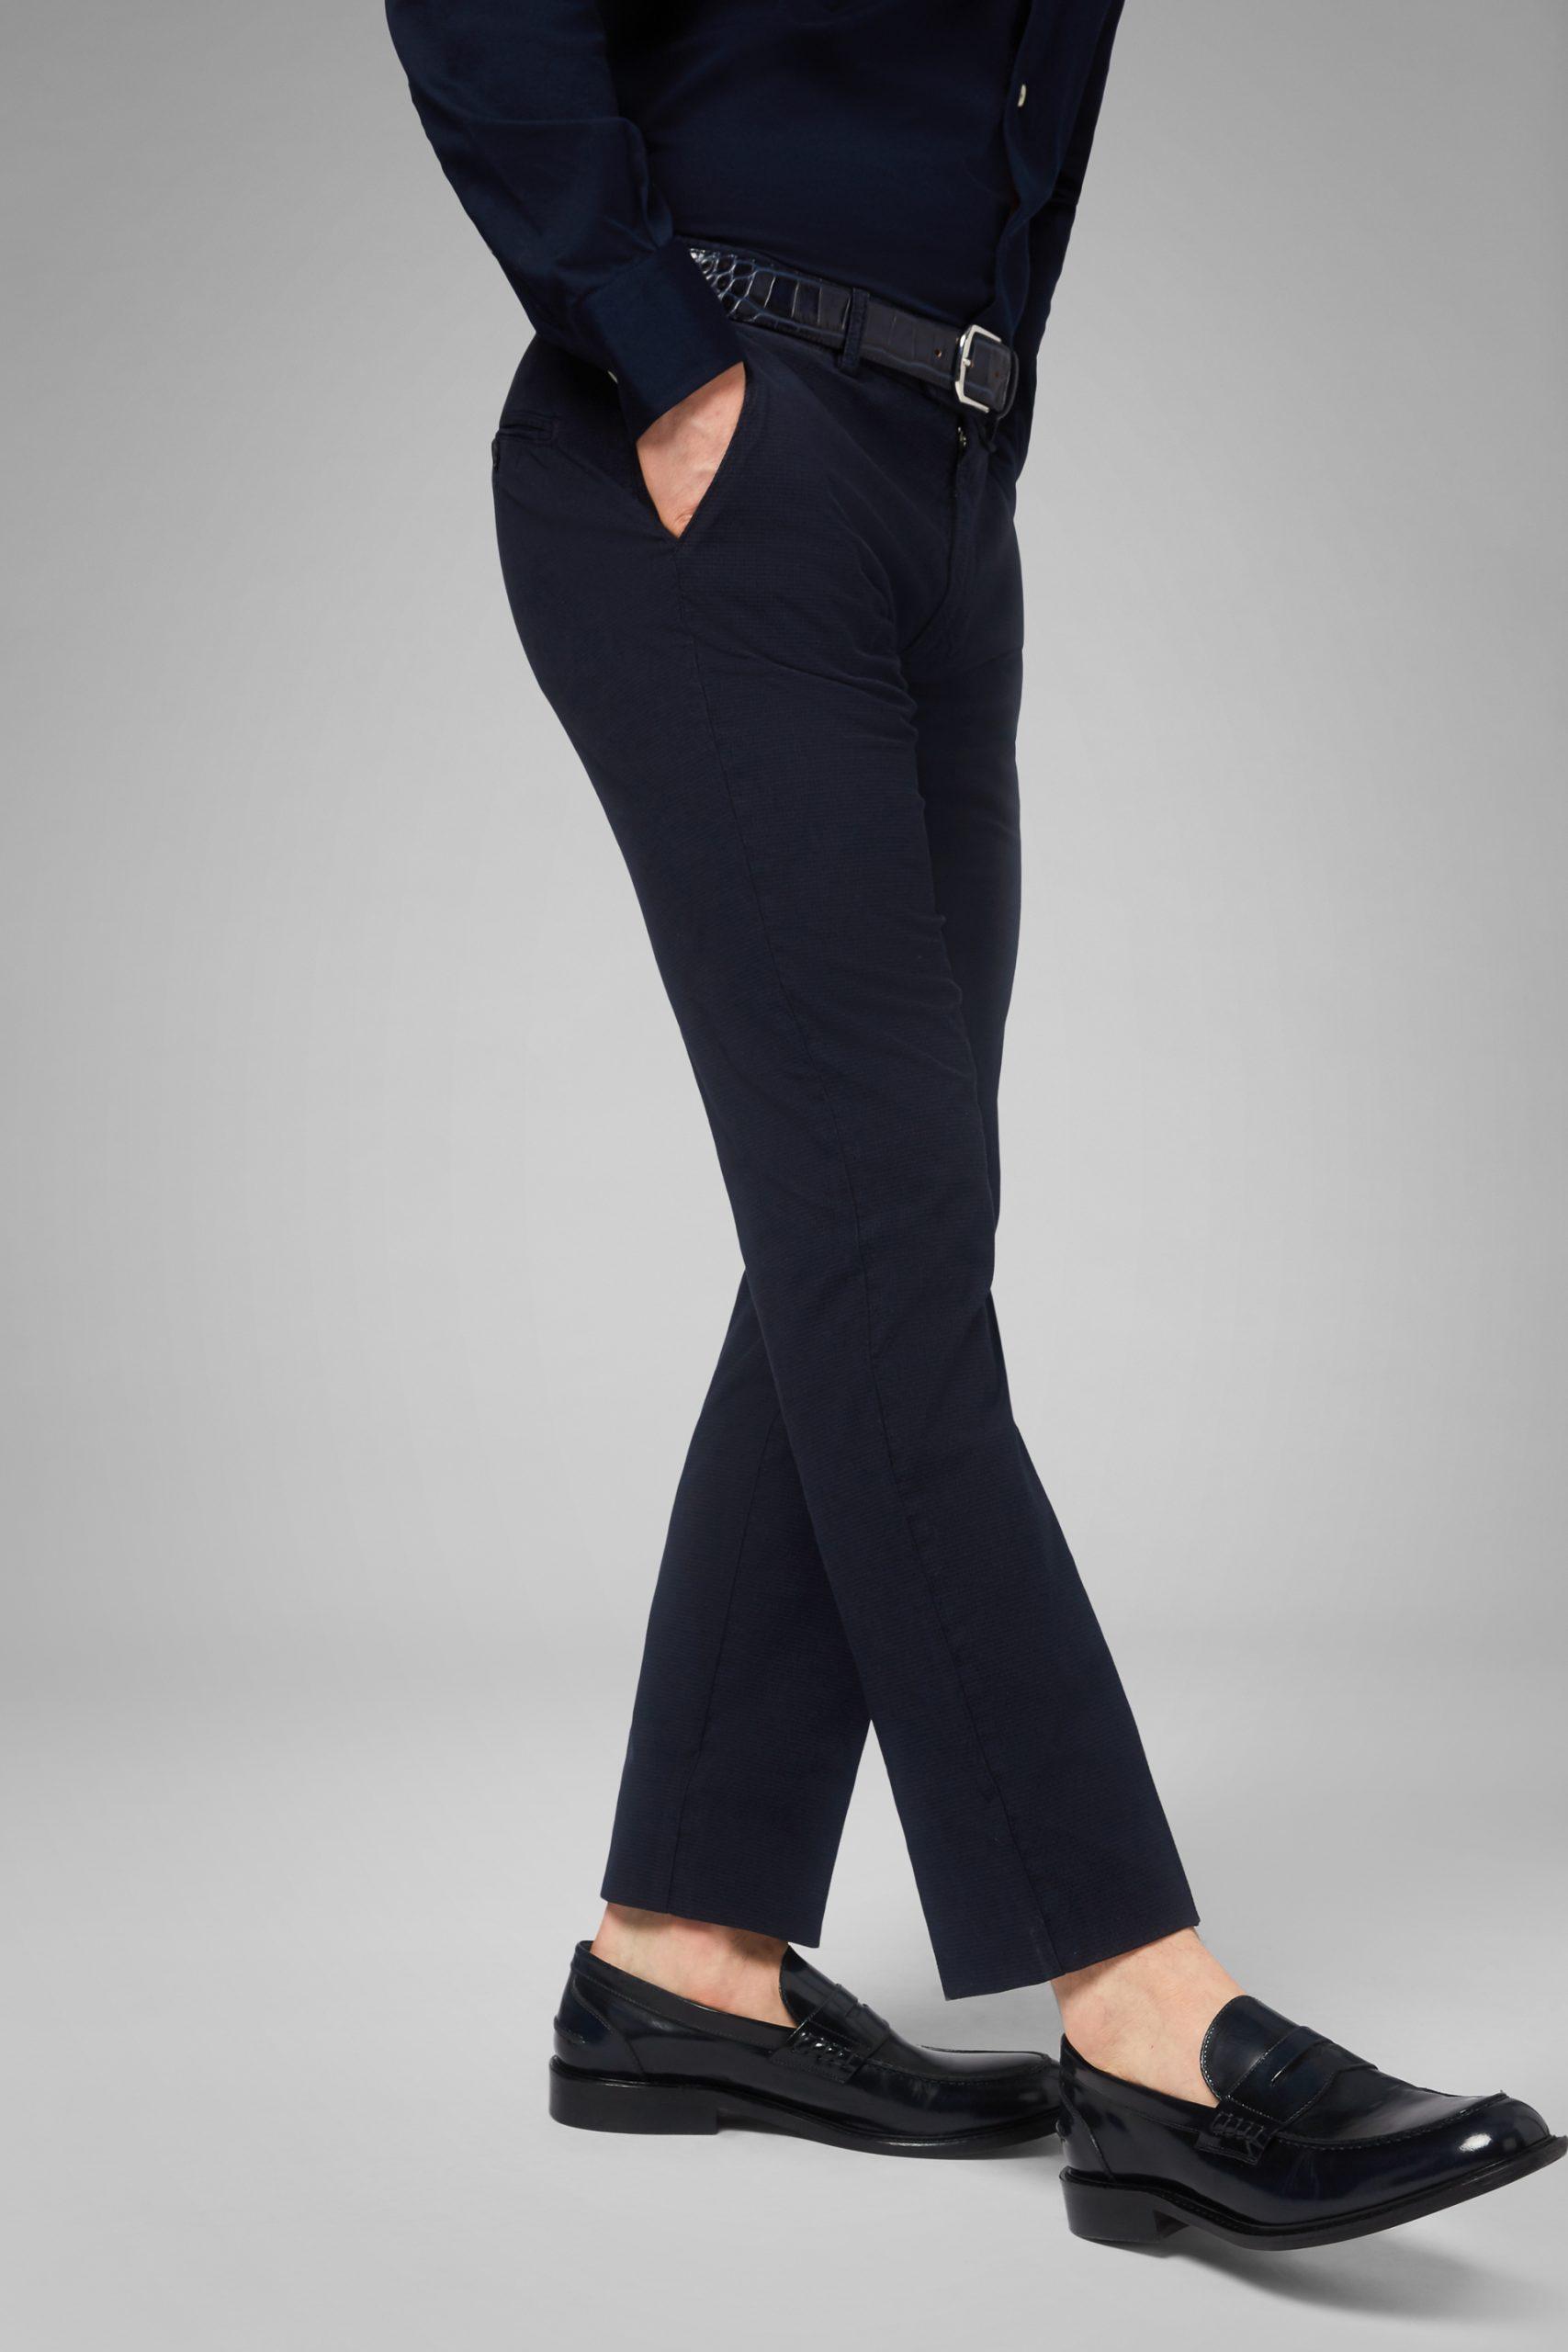 Pantaloni da uomo in colore Navy Blu in materiale